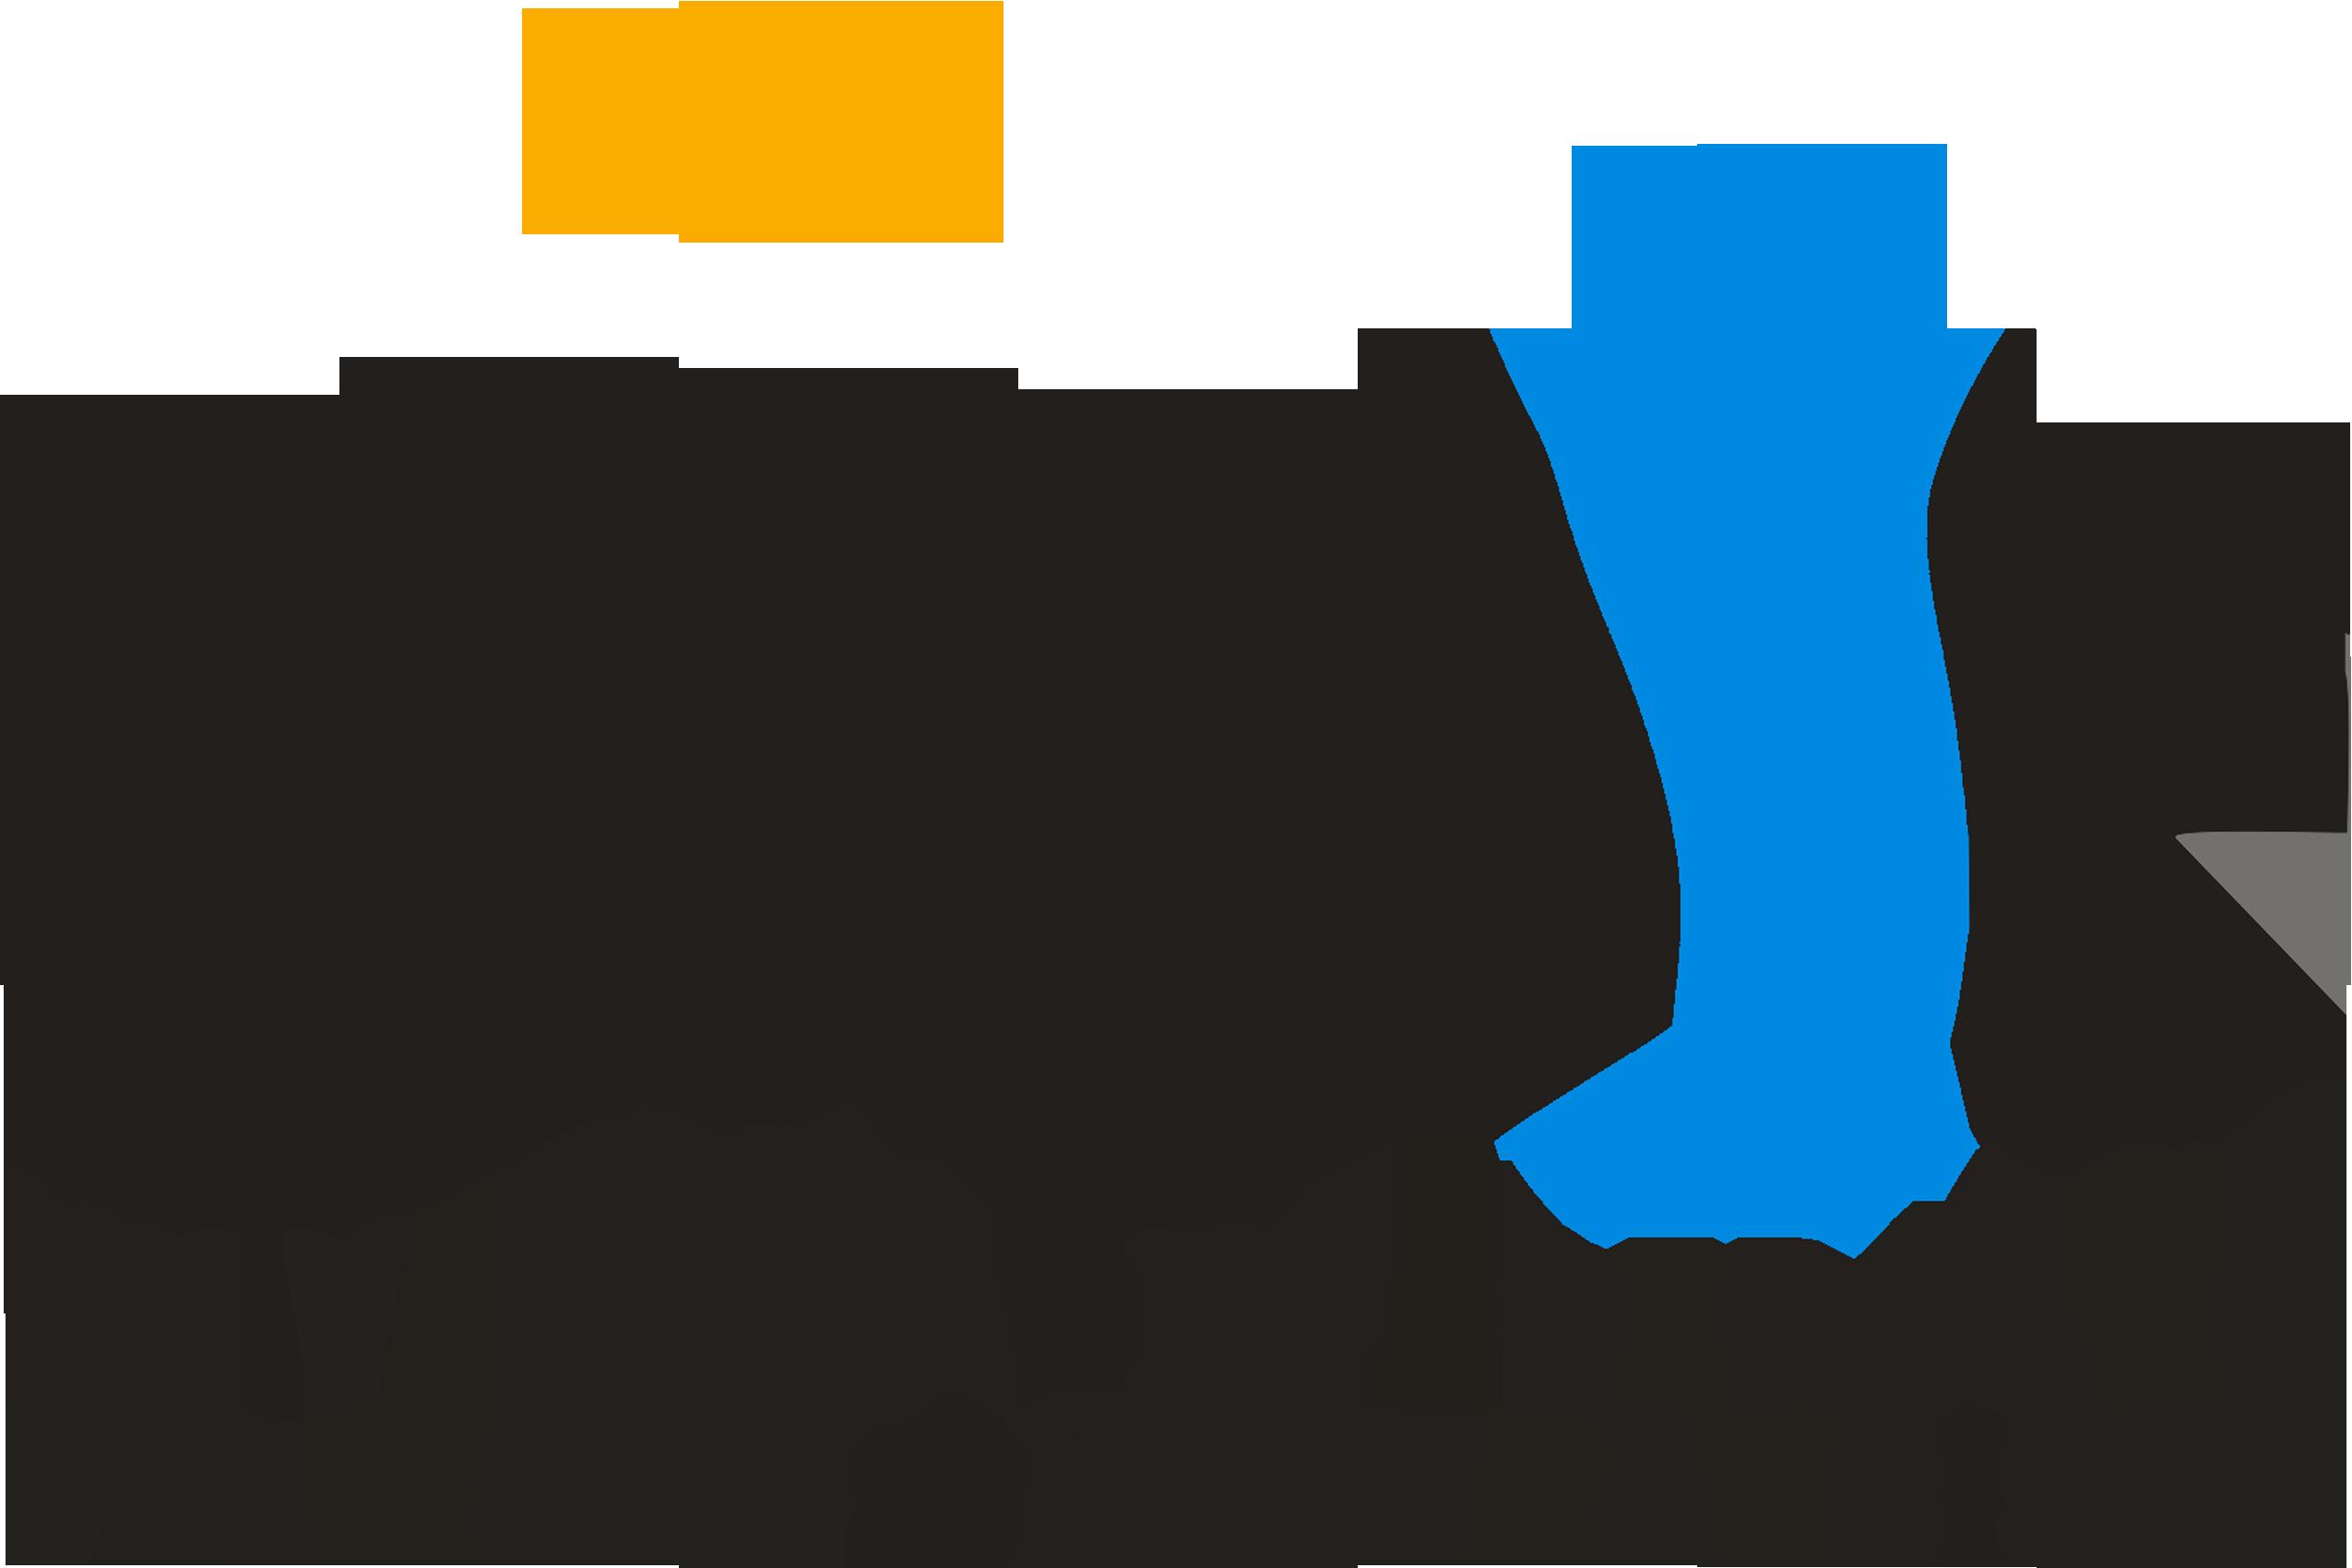 Univasf (PE) confirma 1,6 mil vagas para o SISU 2019